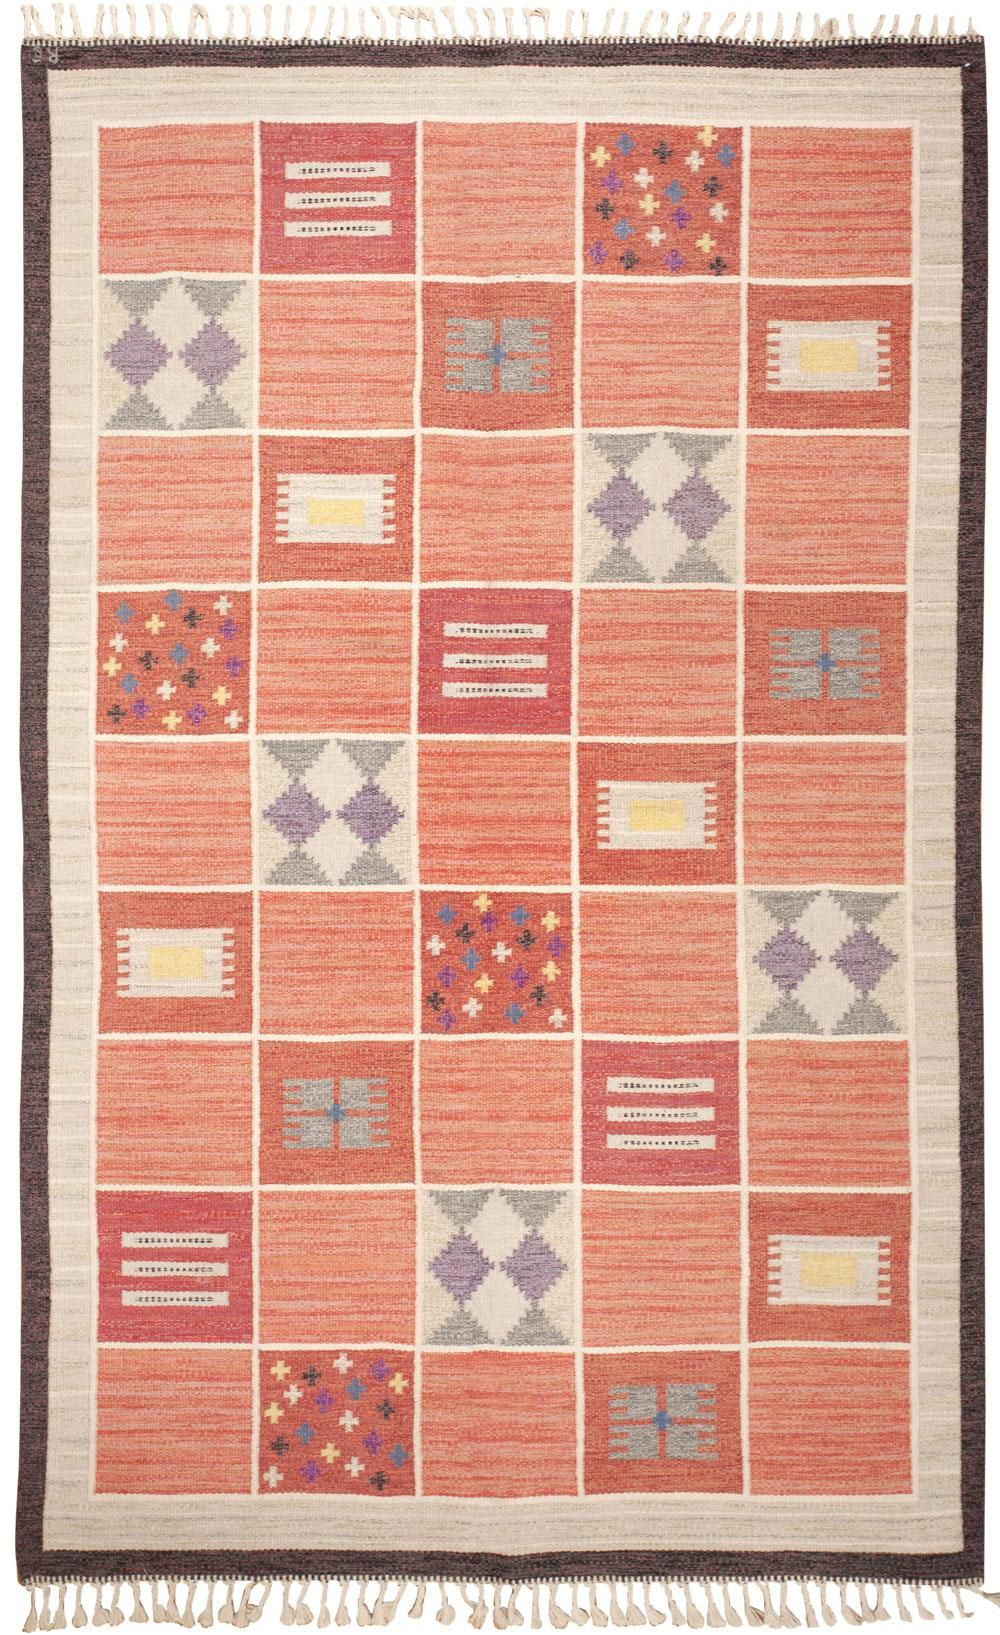 Scandinavian Rugs Shop Vintage Scandinavian Carpets And Rugs Scandinavian Rug Swedish Rug Kilim Woven